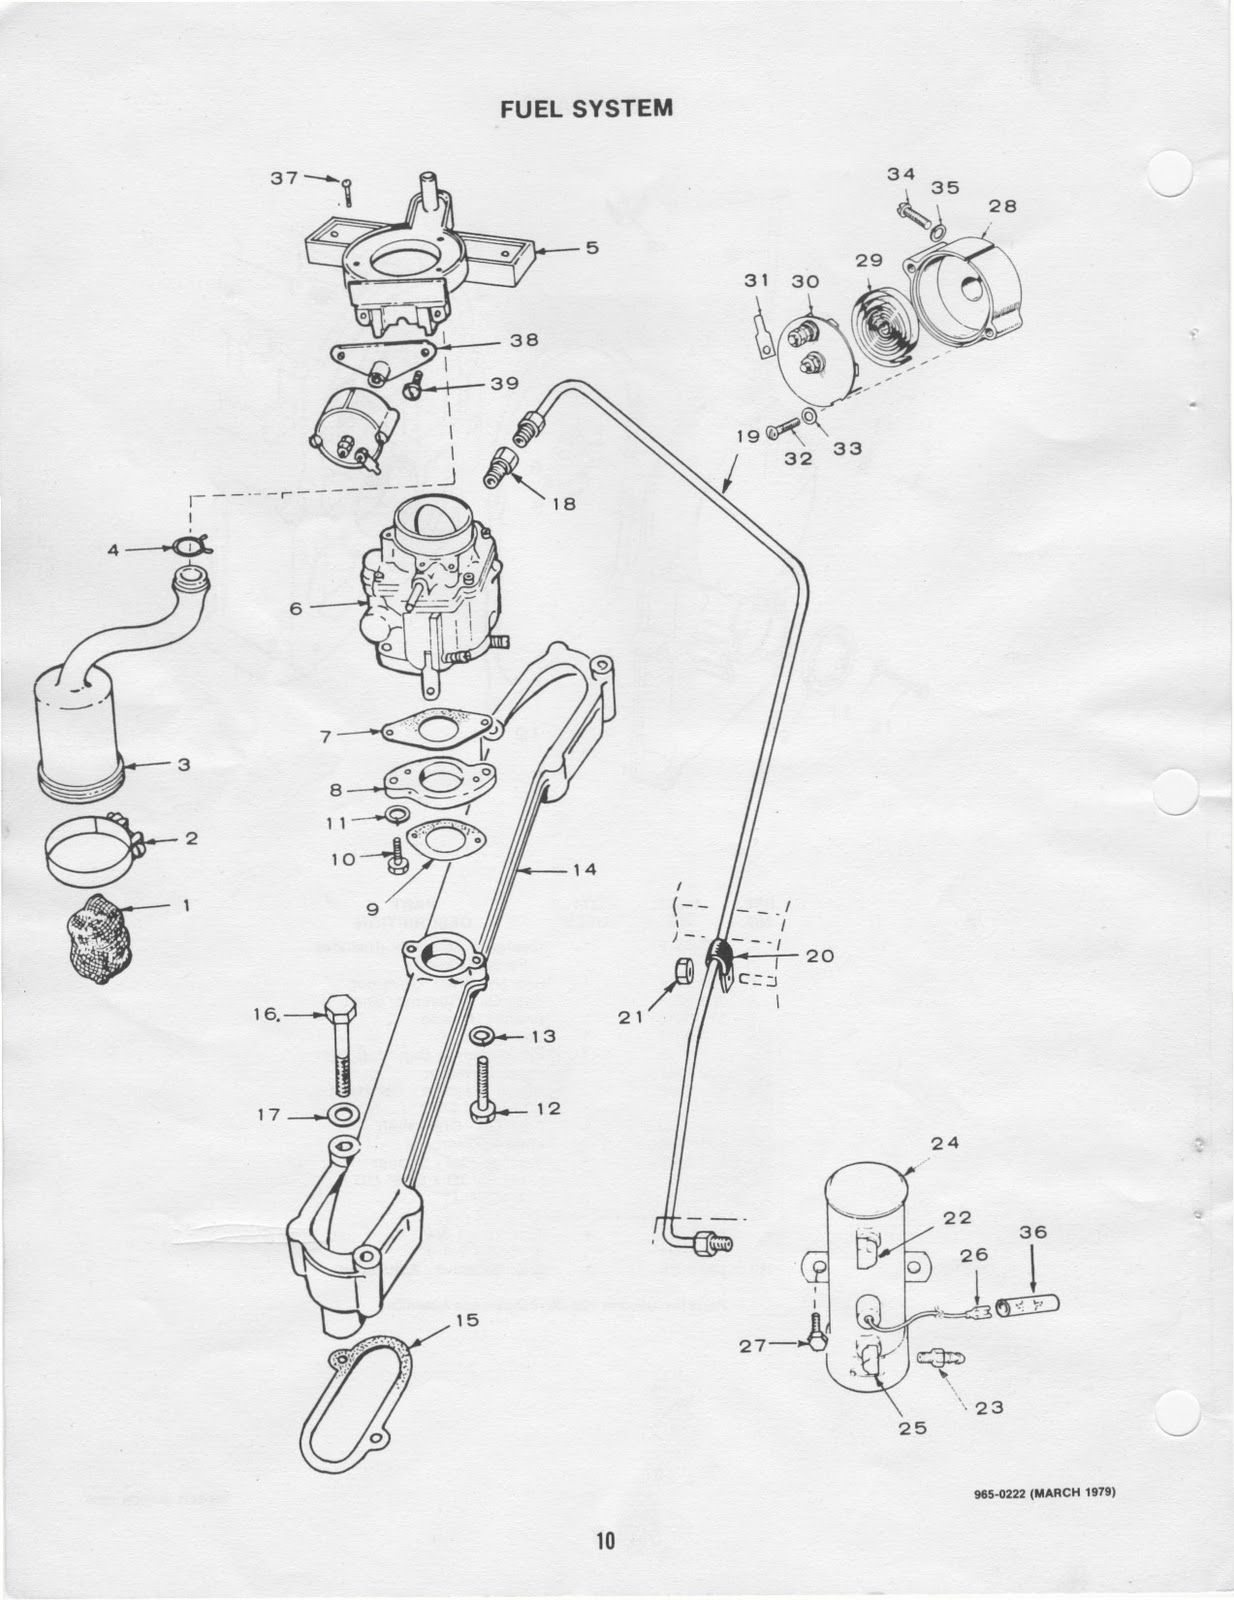 hight resolution of 6 5 kw onan wiring diagram onan control board operation onankohler rv generator wiring diagram kohler